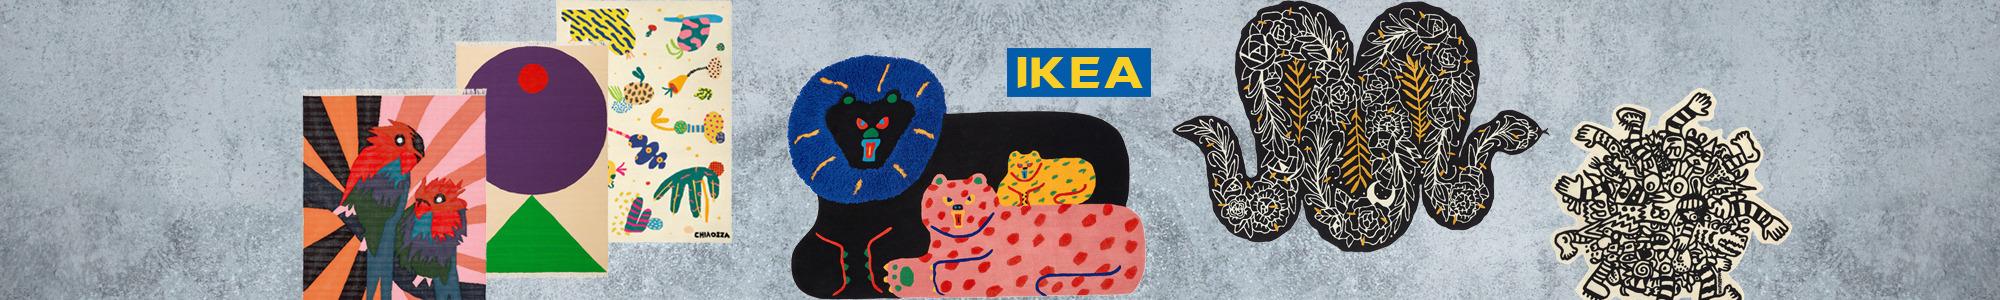 IKEA跨界设计师地毯系列